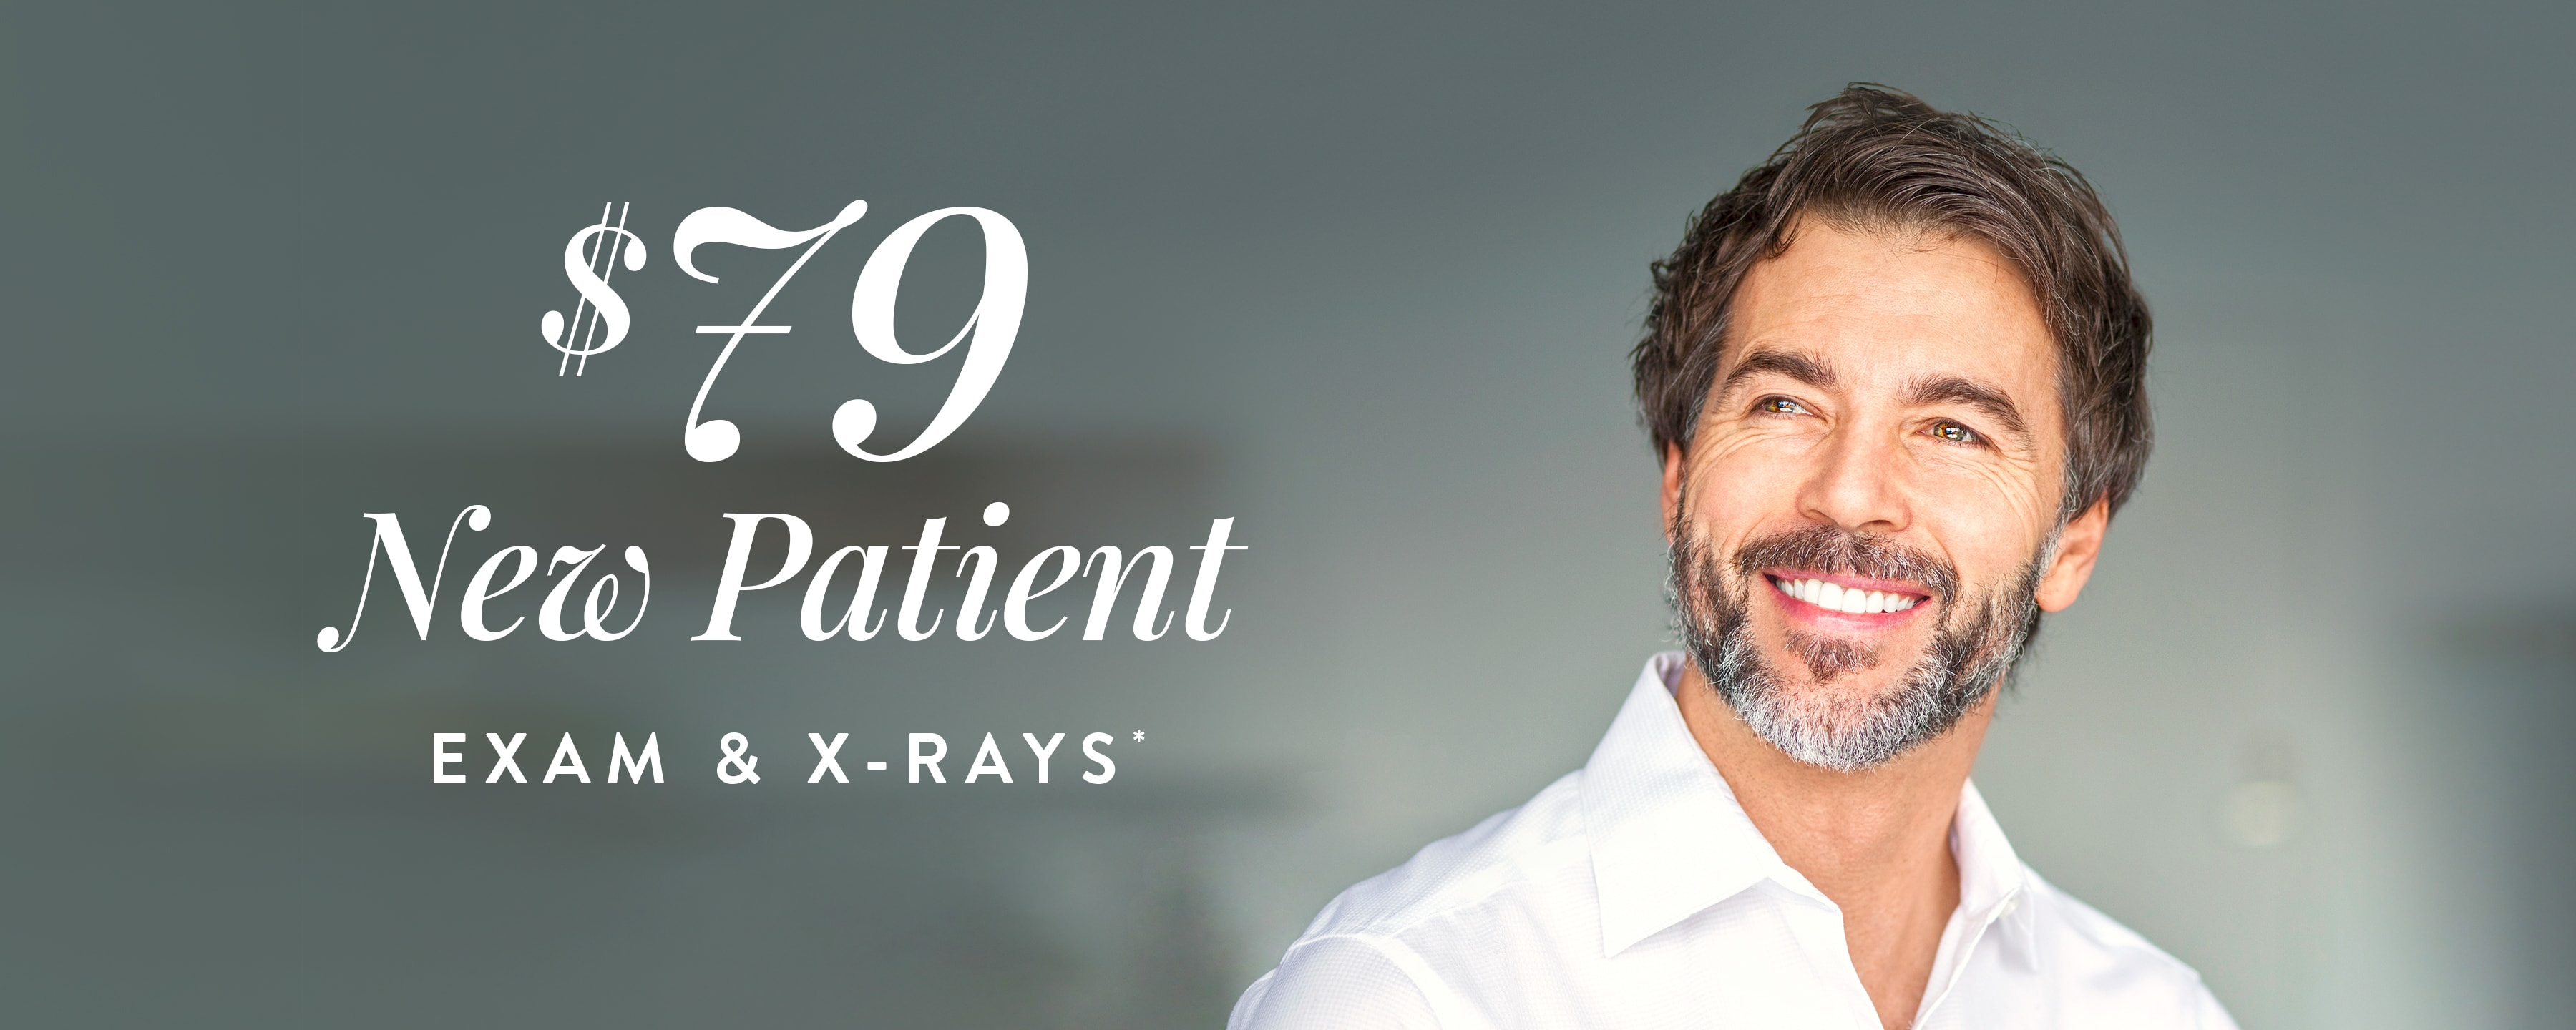 $79 New Patient Special